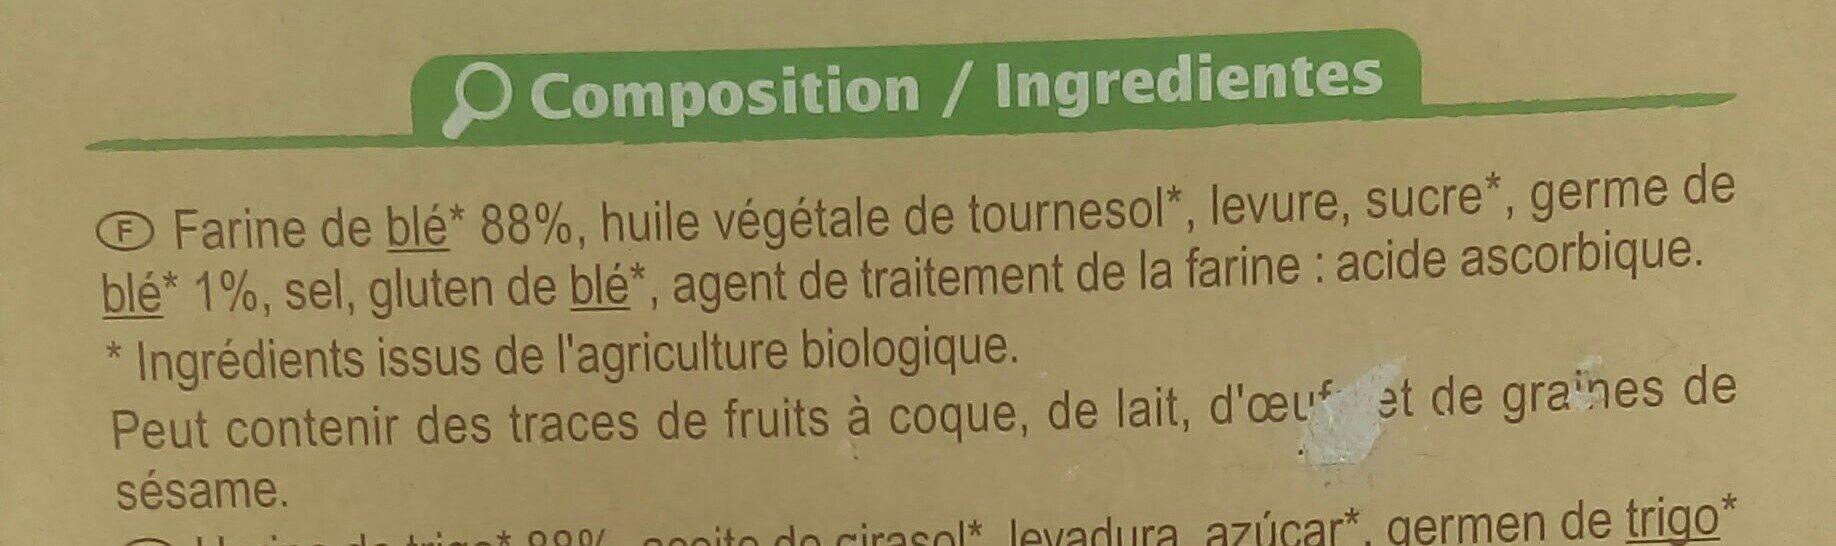 Biscottes bio Carrefour - Ingrediënten